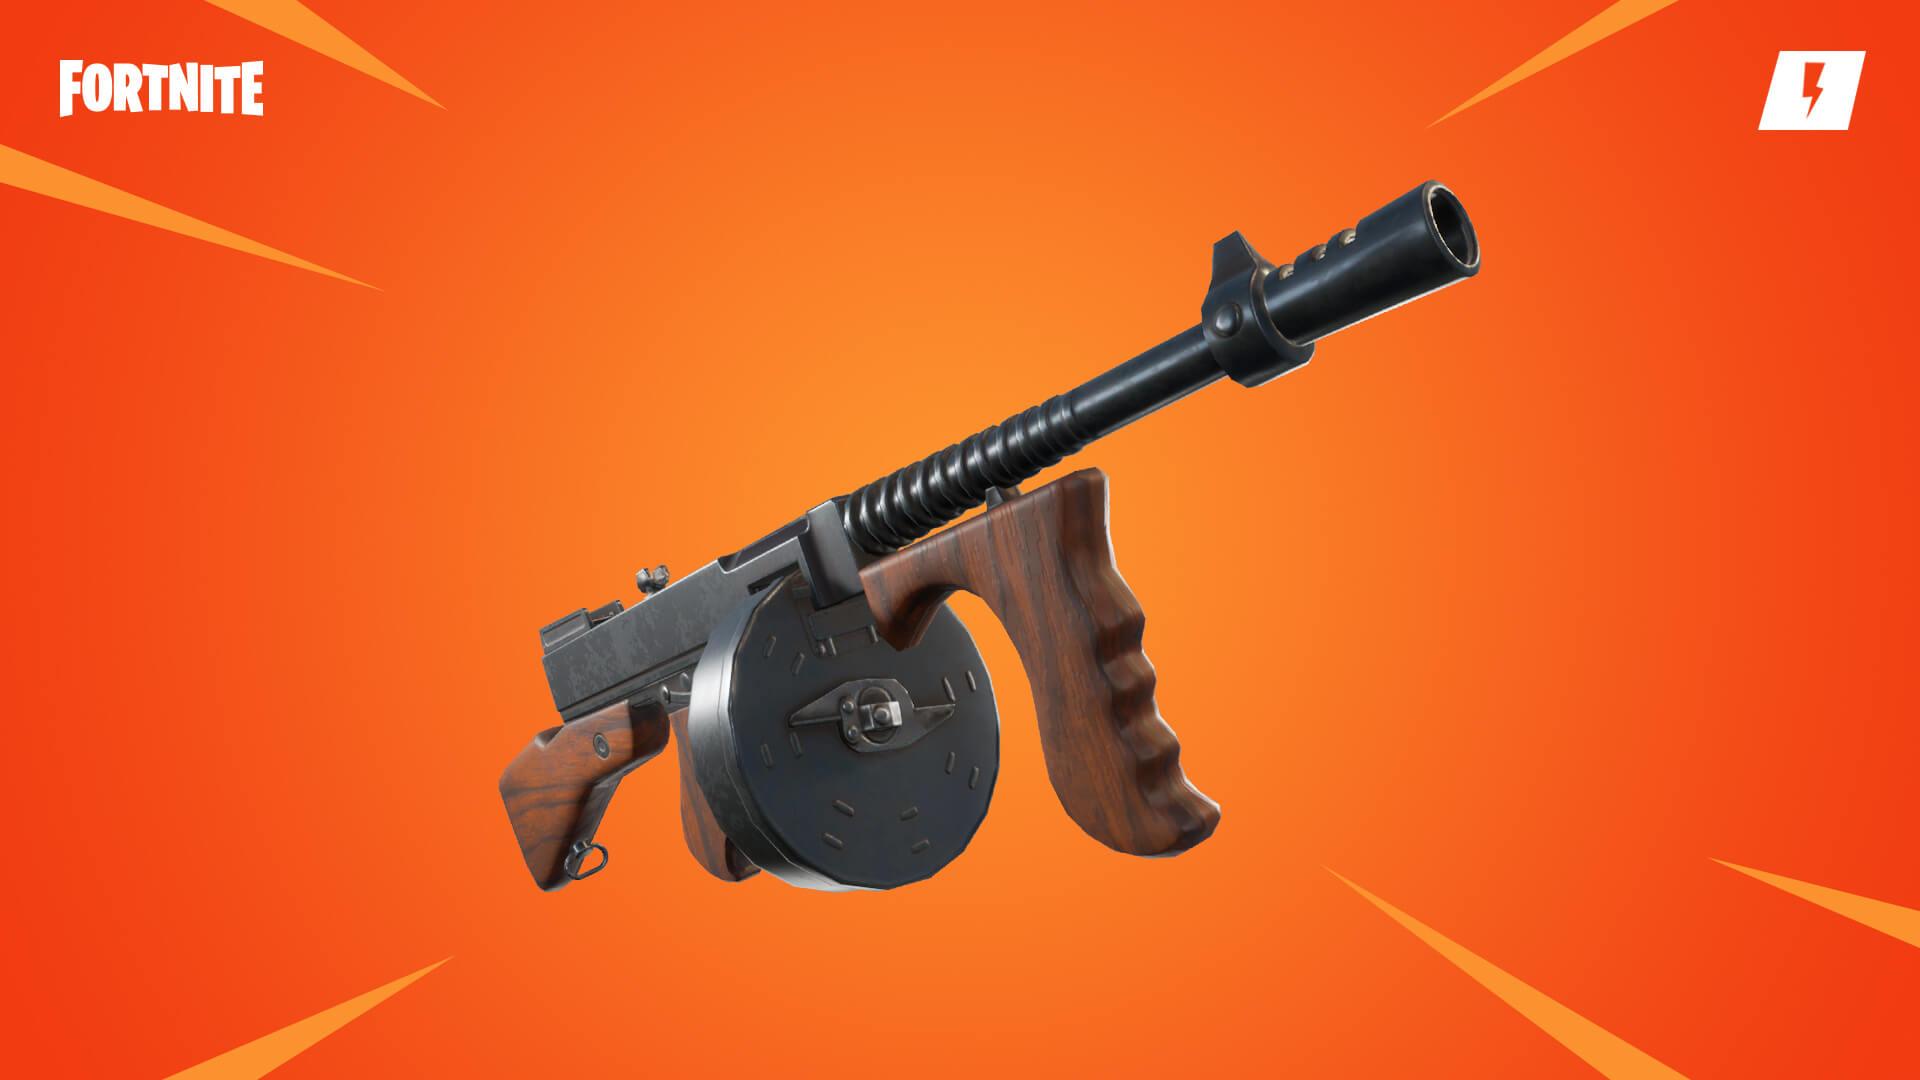 Fortnite v10 00 Update Detailed, Adding New Automatic Sniper